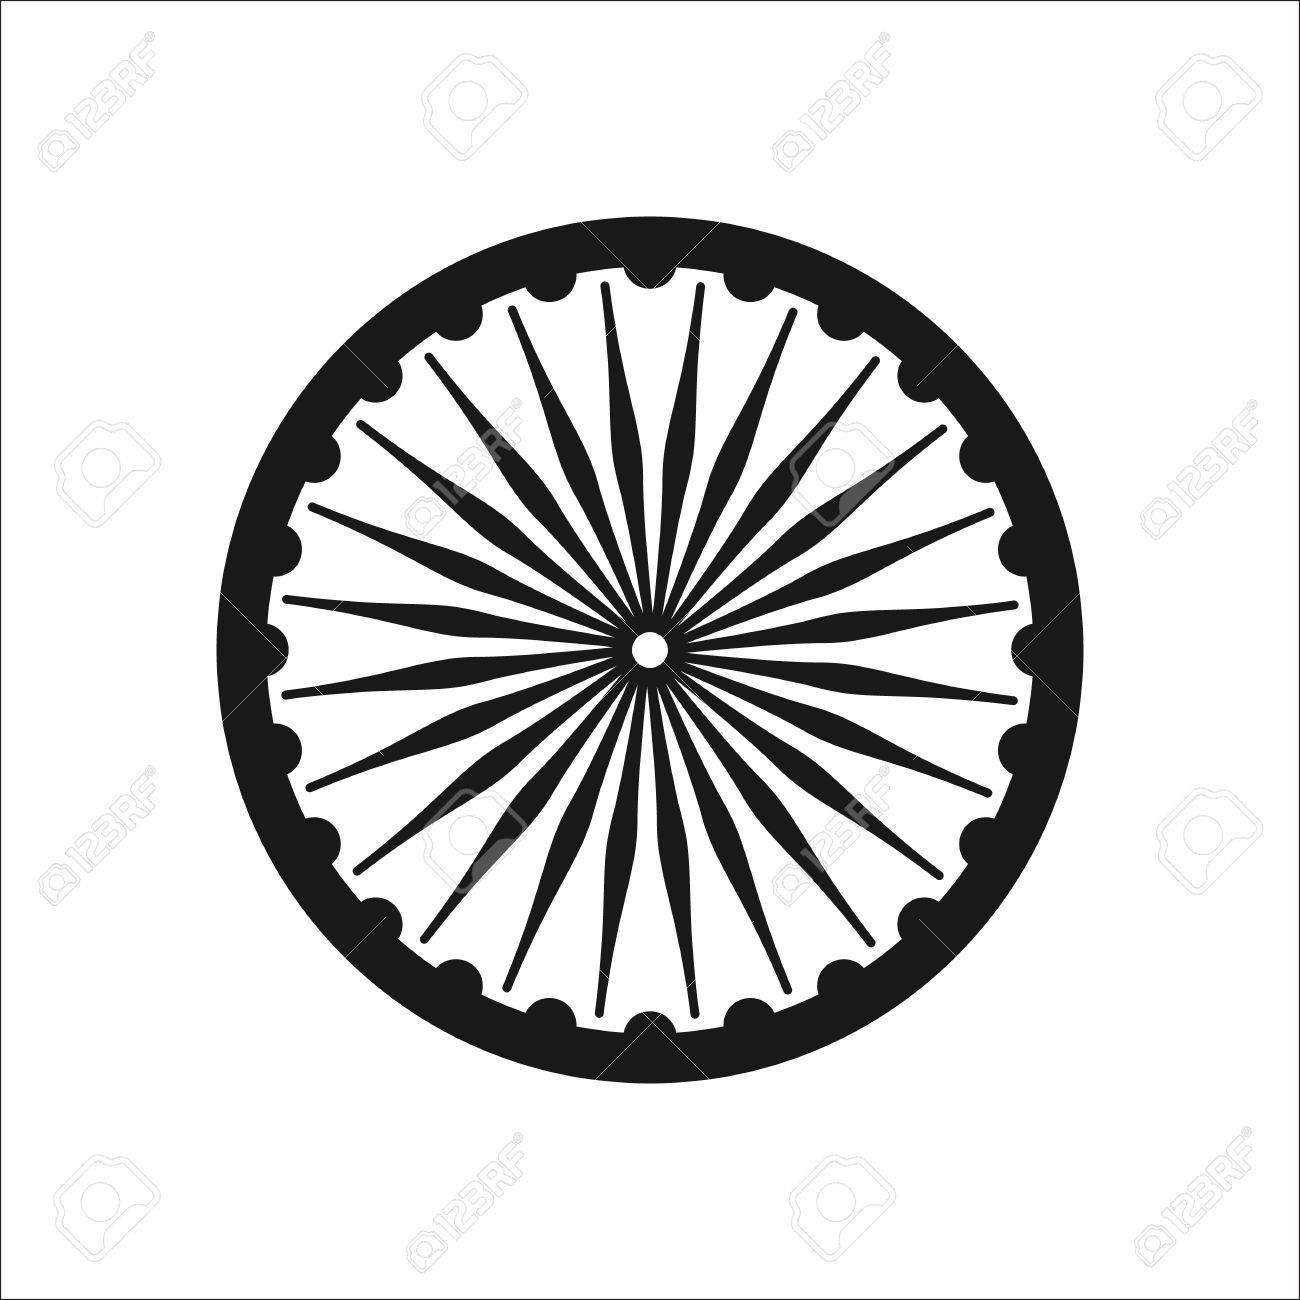 Ashoka Chakra symbol sign silhouette icon on background.